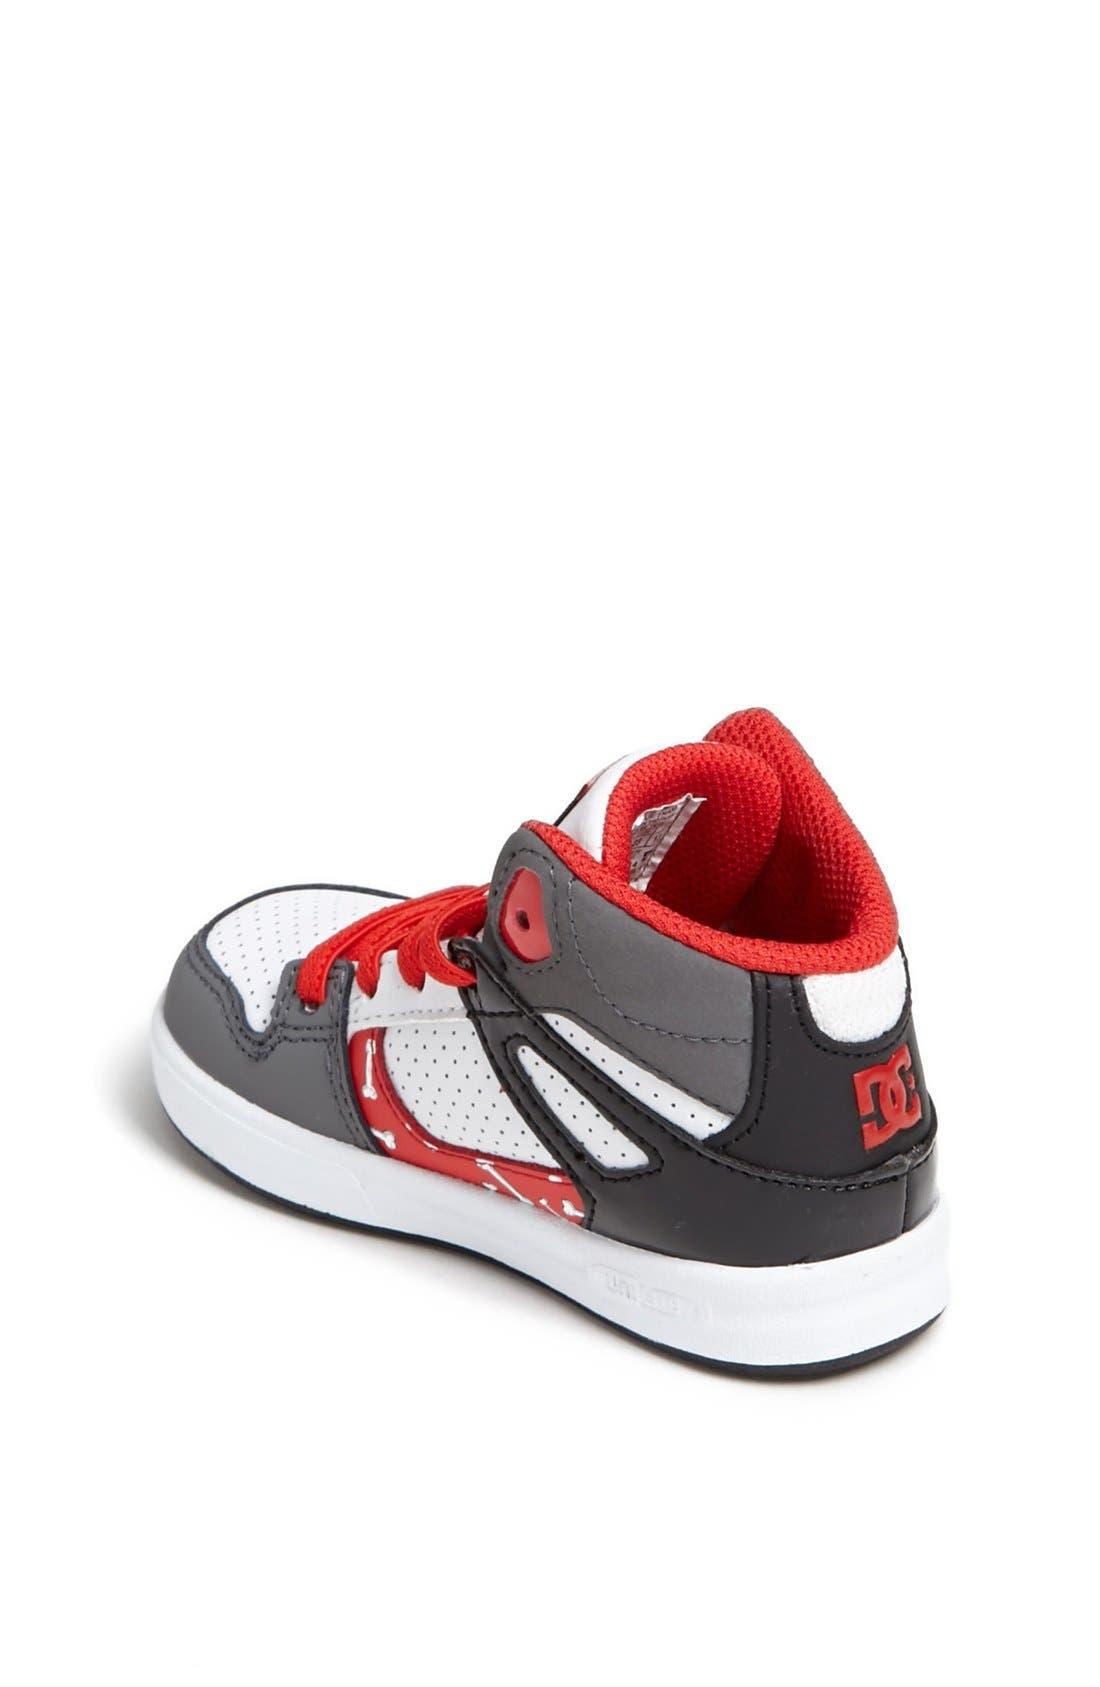 Alternate Image 2  - DC Shoes 'Wild Grinders - Rebound' Sneaker (Walker & Toddler)